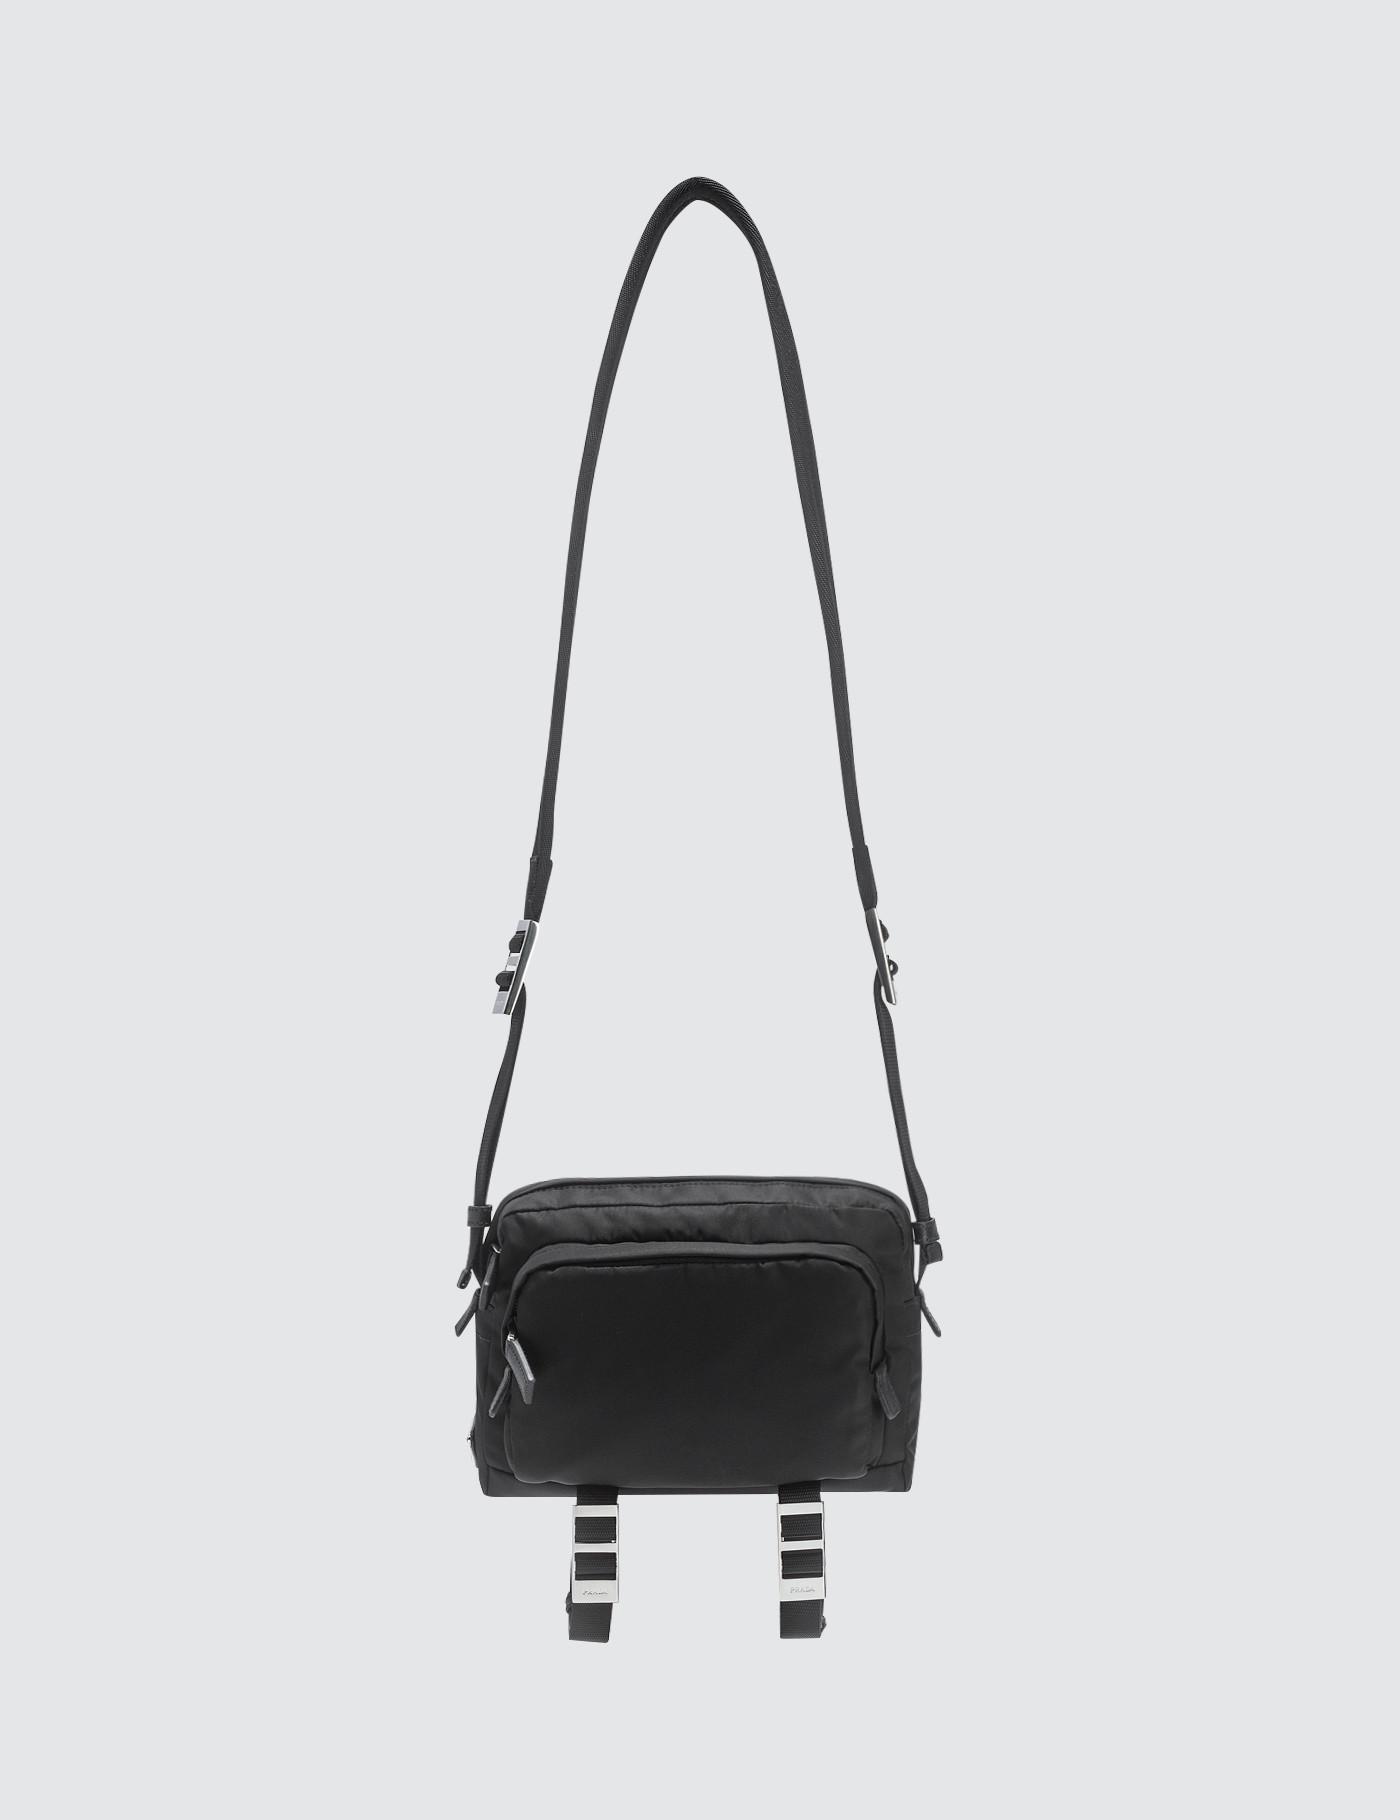 Lyst - Prada Camera Bag With Logo in Black for Men - Save 5% 205b4e66445f1